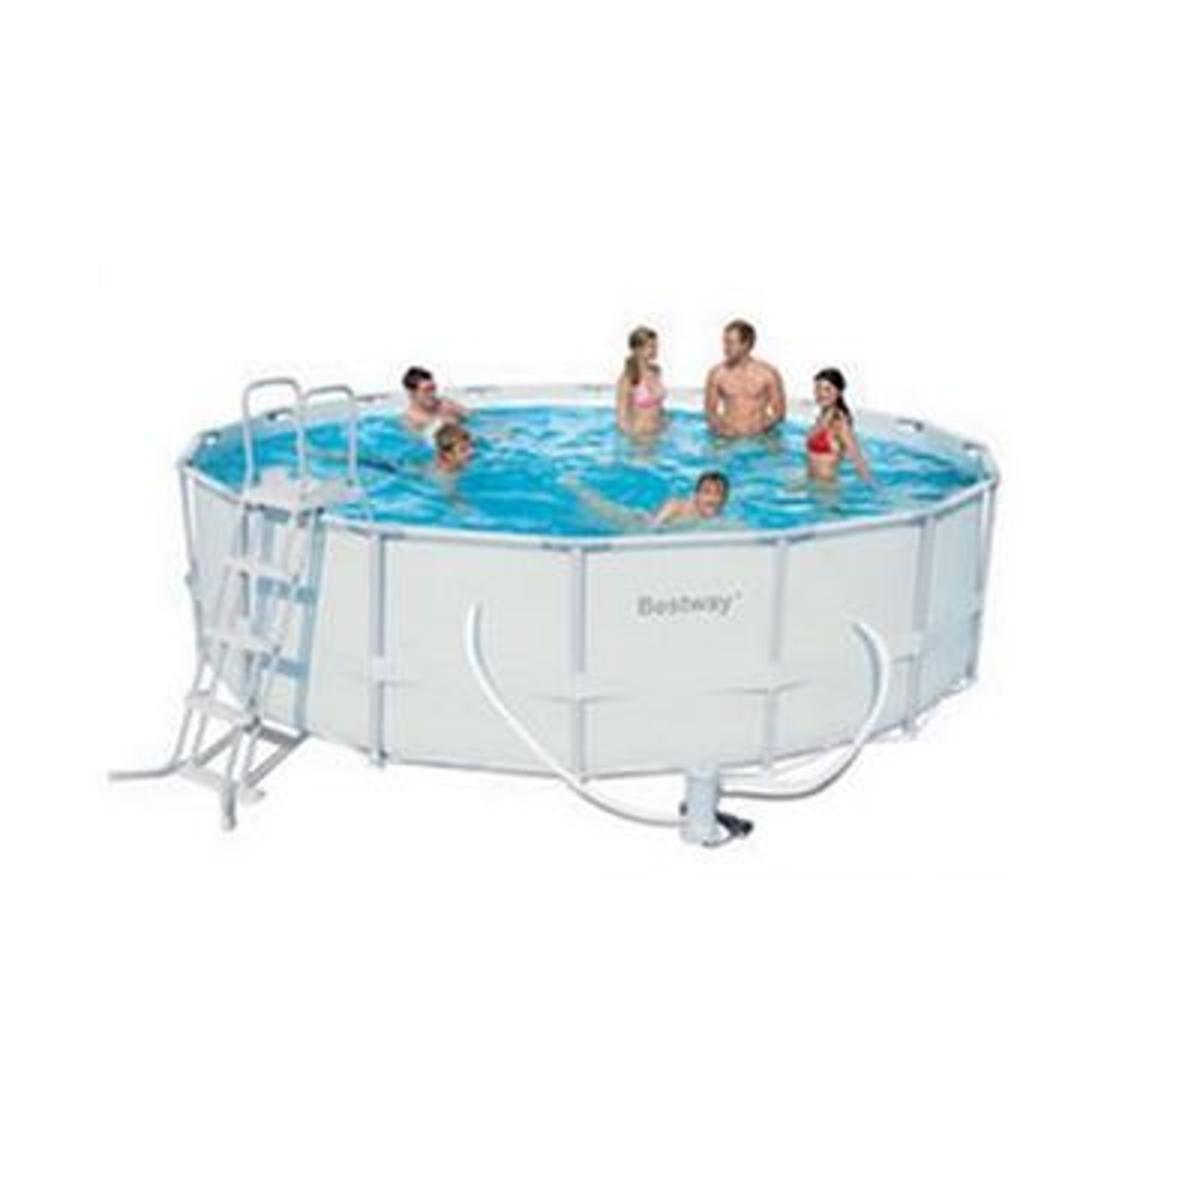 piscine power steel frame tubulaire 404x201x100cm vendu. Black Bedroom Furniture Sets. Home Design Ideas